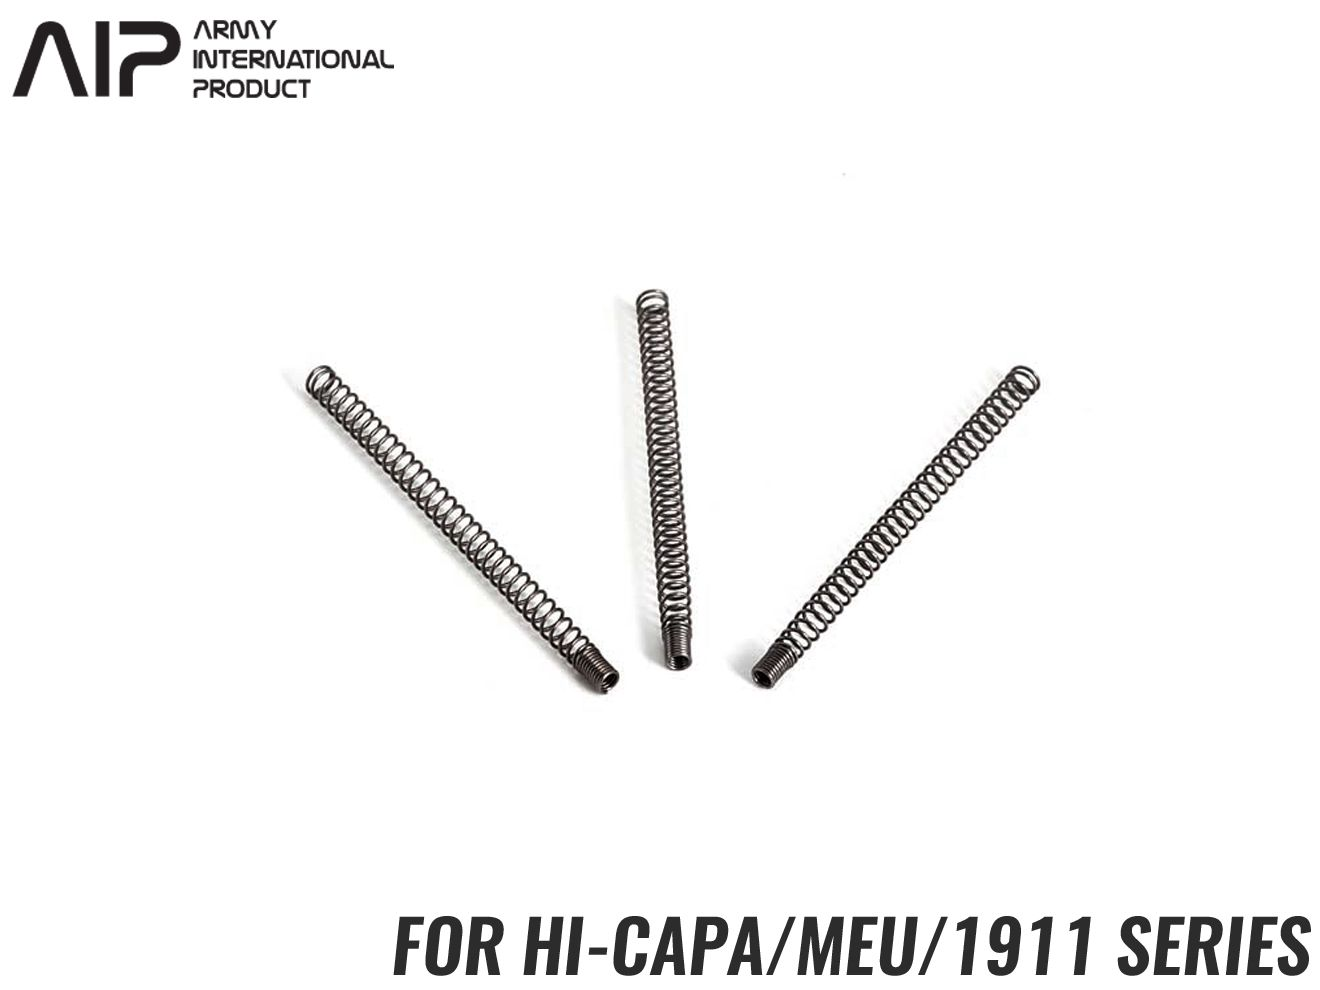 AIP 120% ノズルリターンスプリング Hi-CAPA/MEU/1911◆東京マルイ GBB ハイキャパ/MEU/1911シリーズ対応 ピストンリターンSP リペア予備に